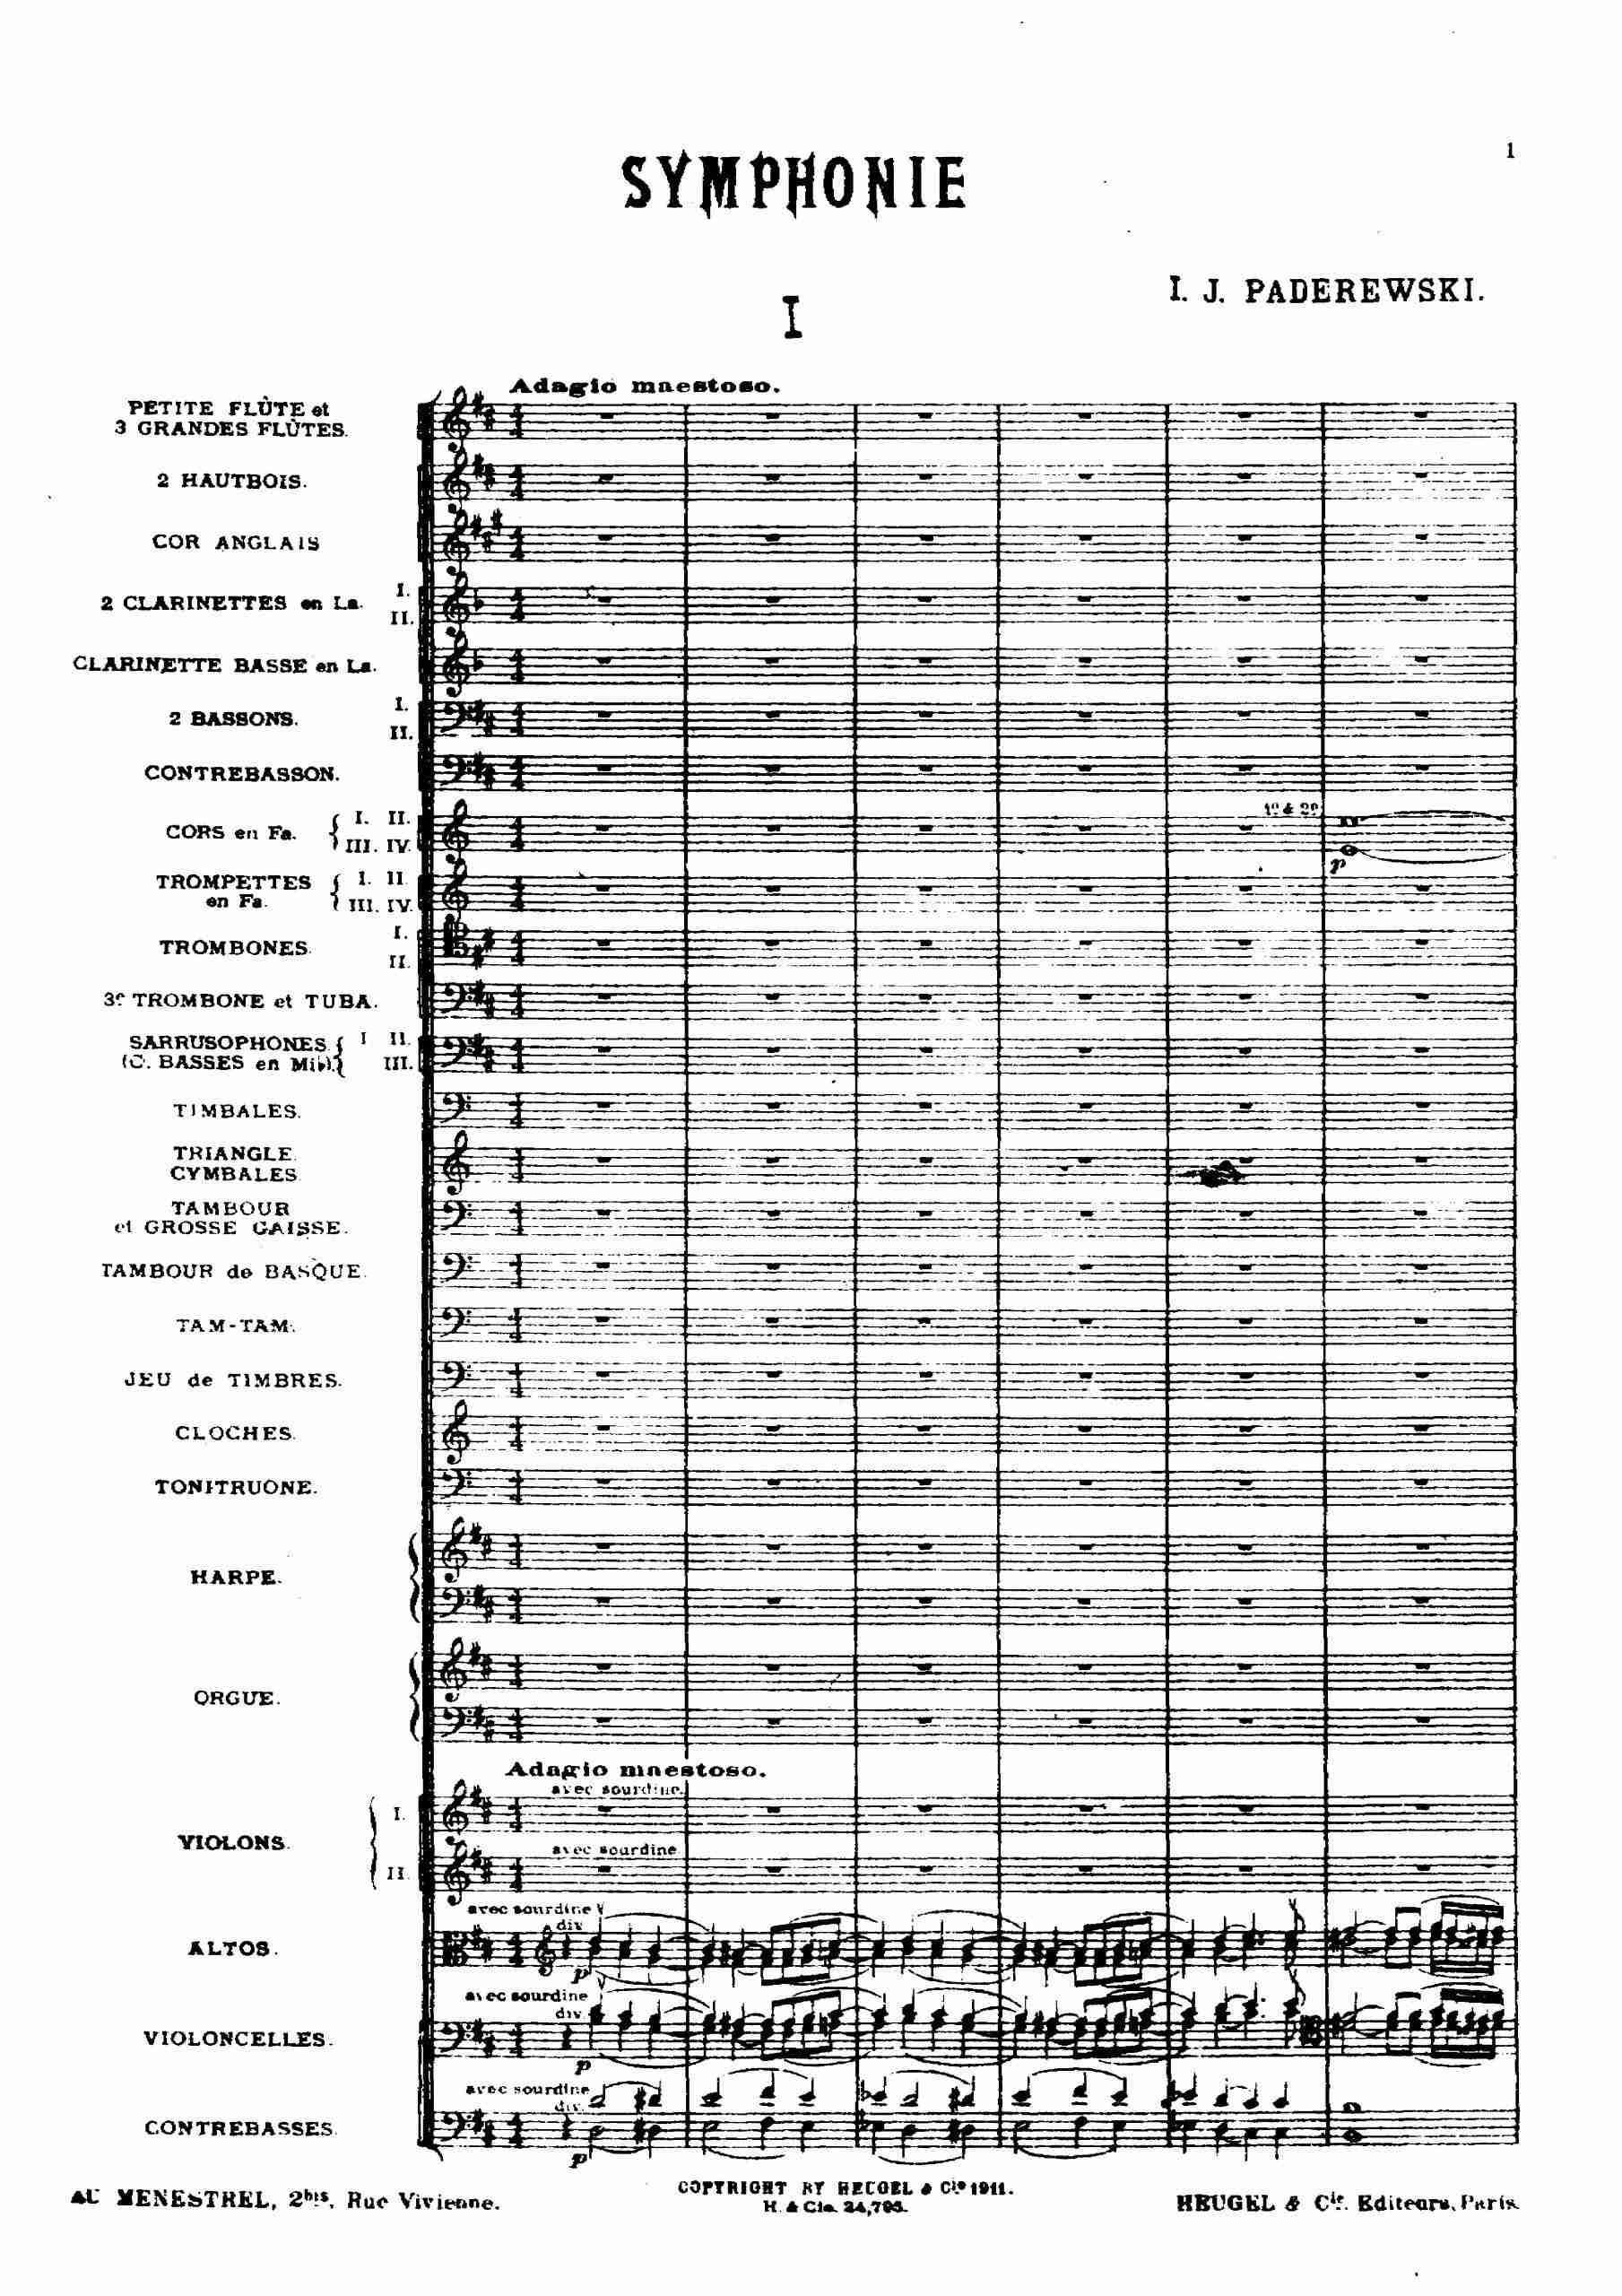 Paderewski, Ignacy Jan - Symphony, Op.24 score 1